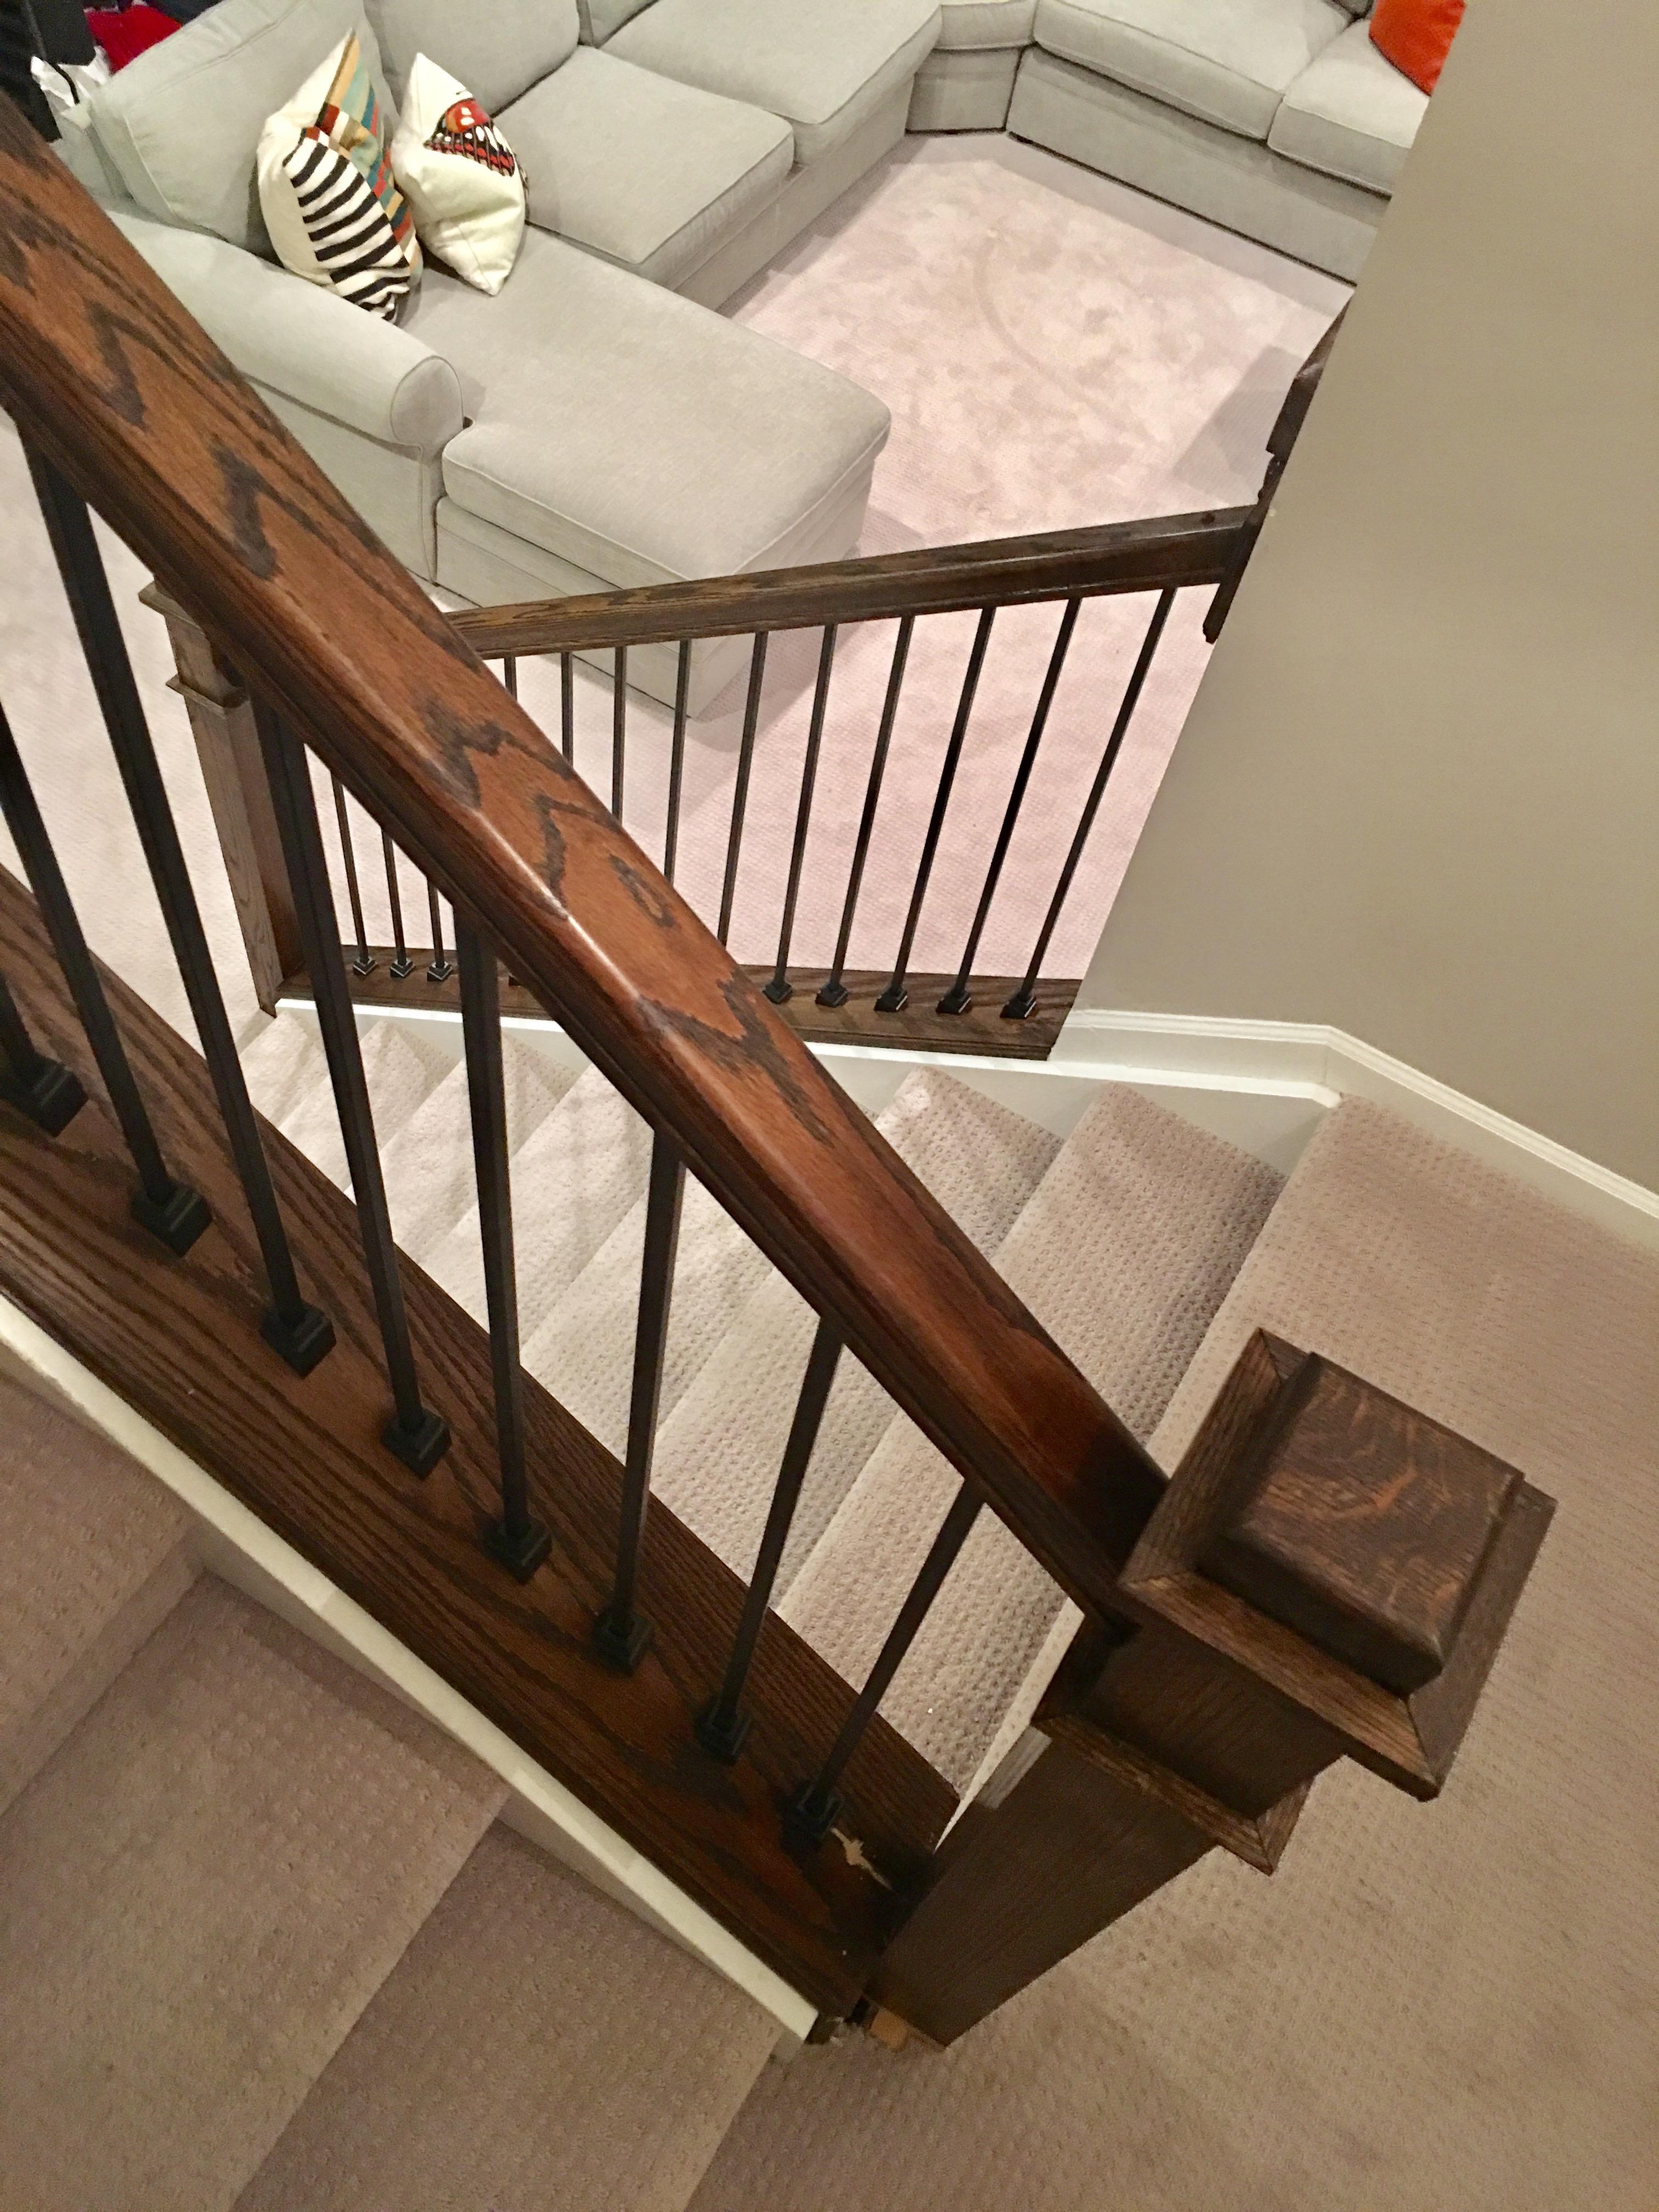 DIY Stair Railing